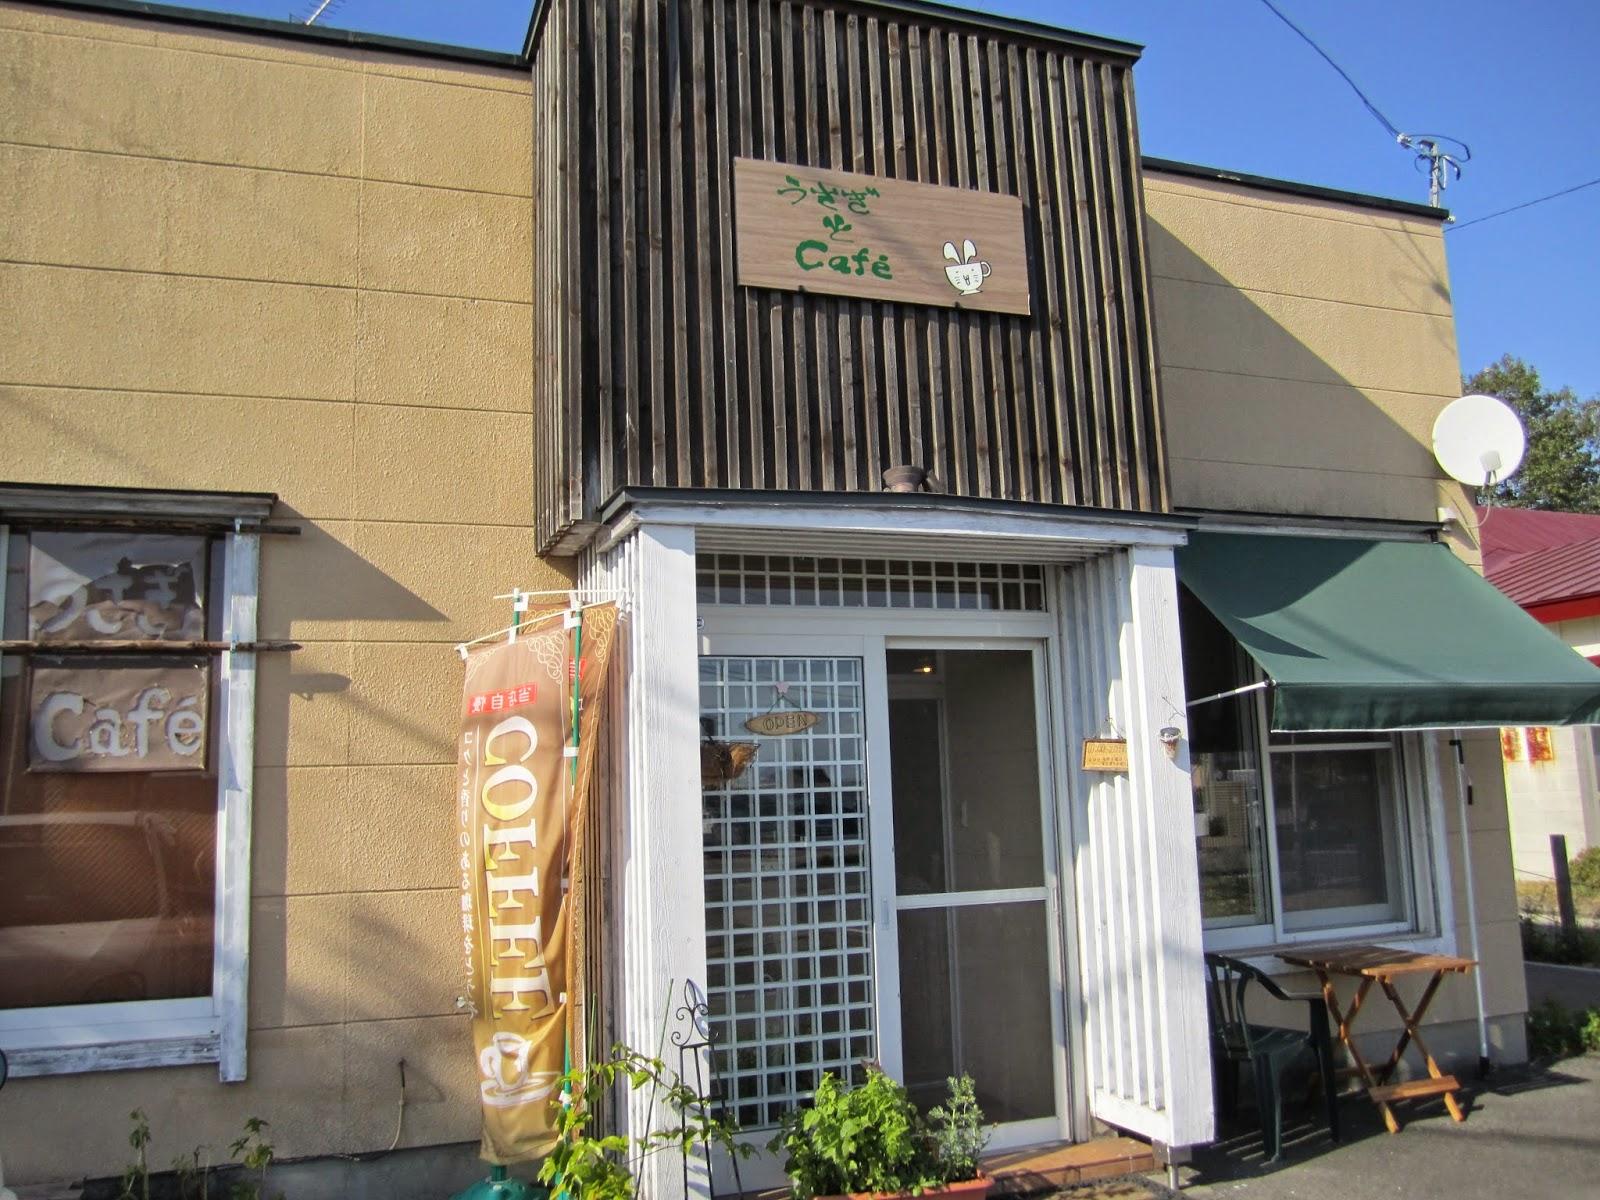 Towada Bunny Rabbit Cafe Usa Cafe Lovelies 十和田市うさぎカフェ うさカフェラヴリーズ